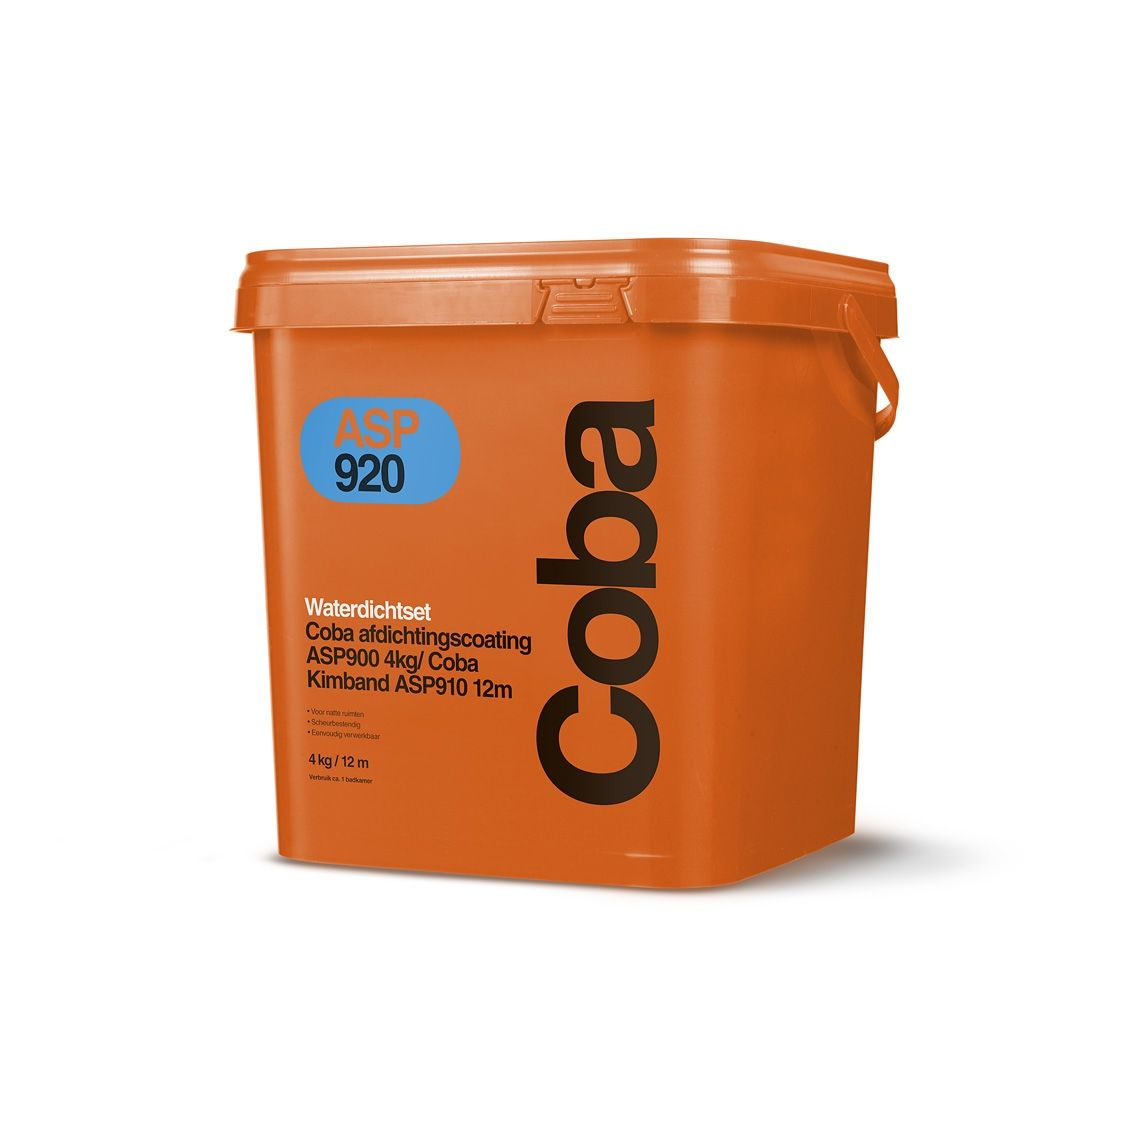 Coba ASP920 afdichtcoating incl. kimband. 4kg pasta en 12m1 kimband.